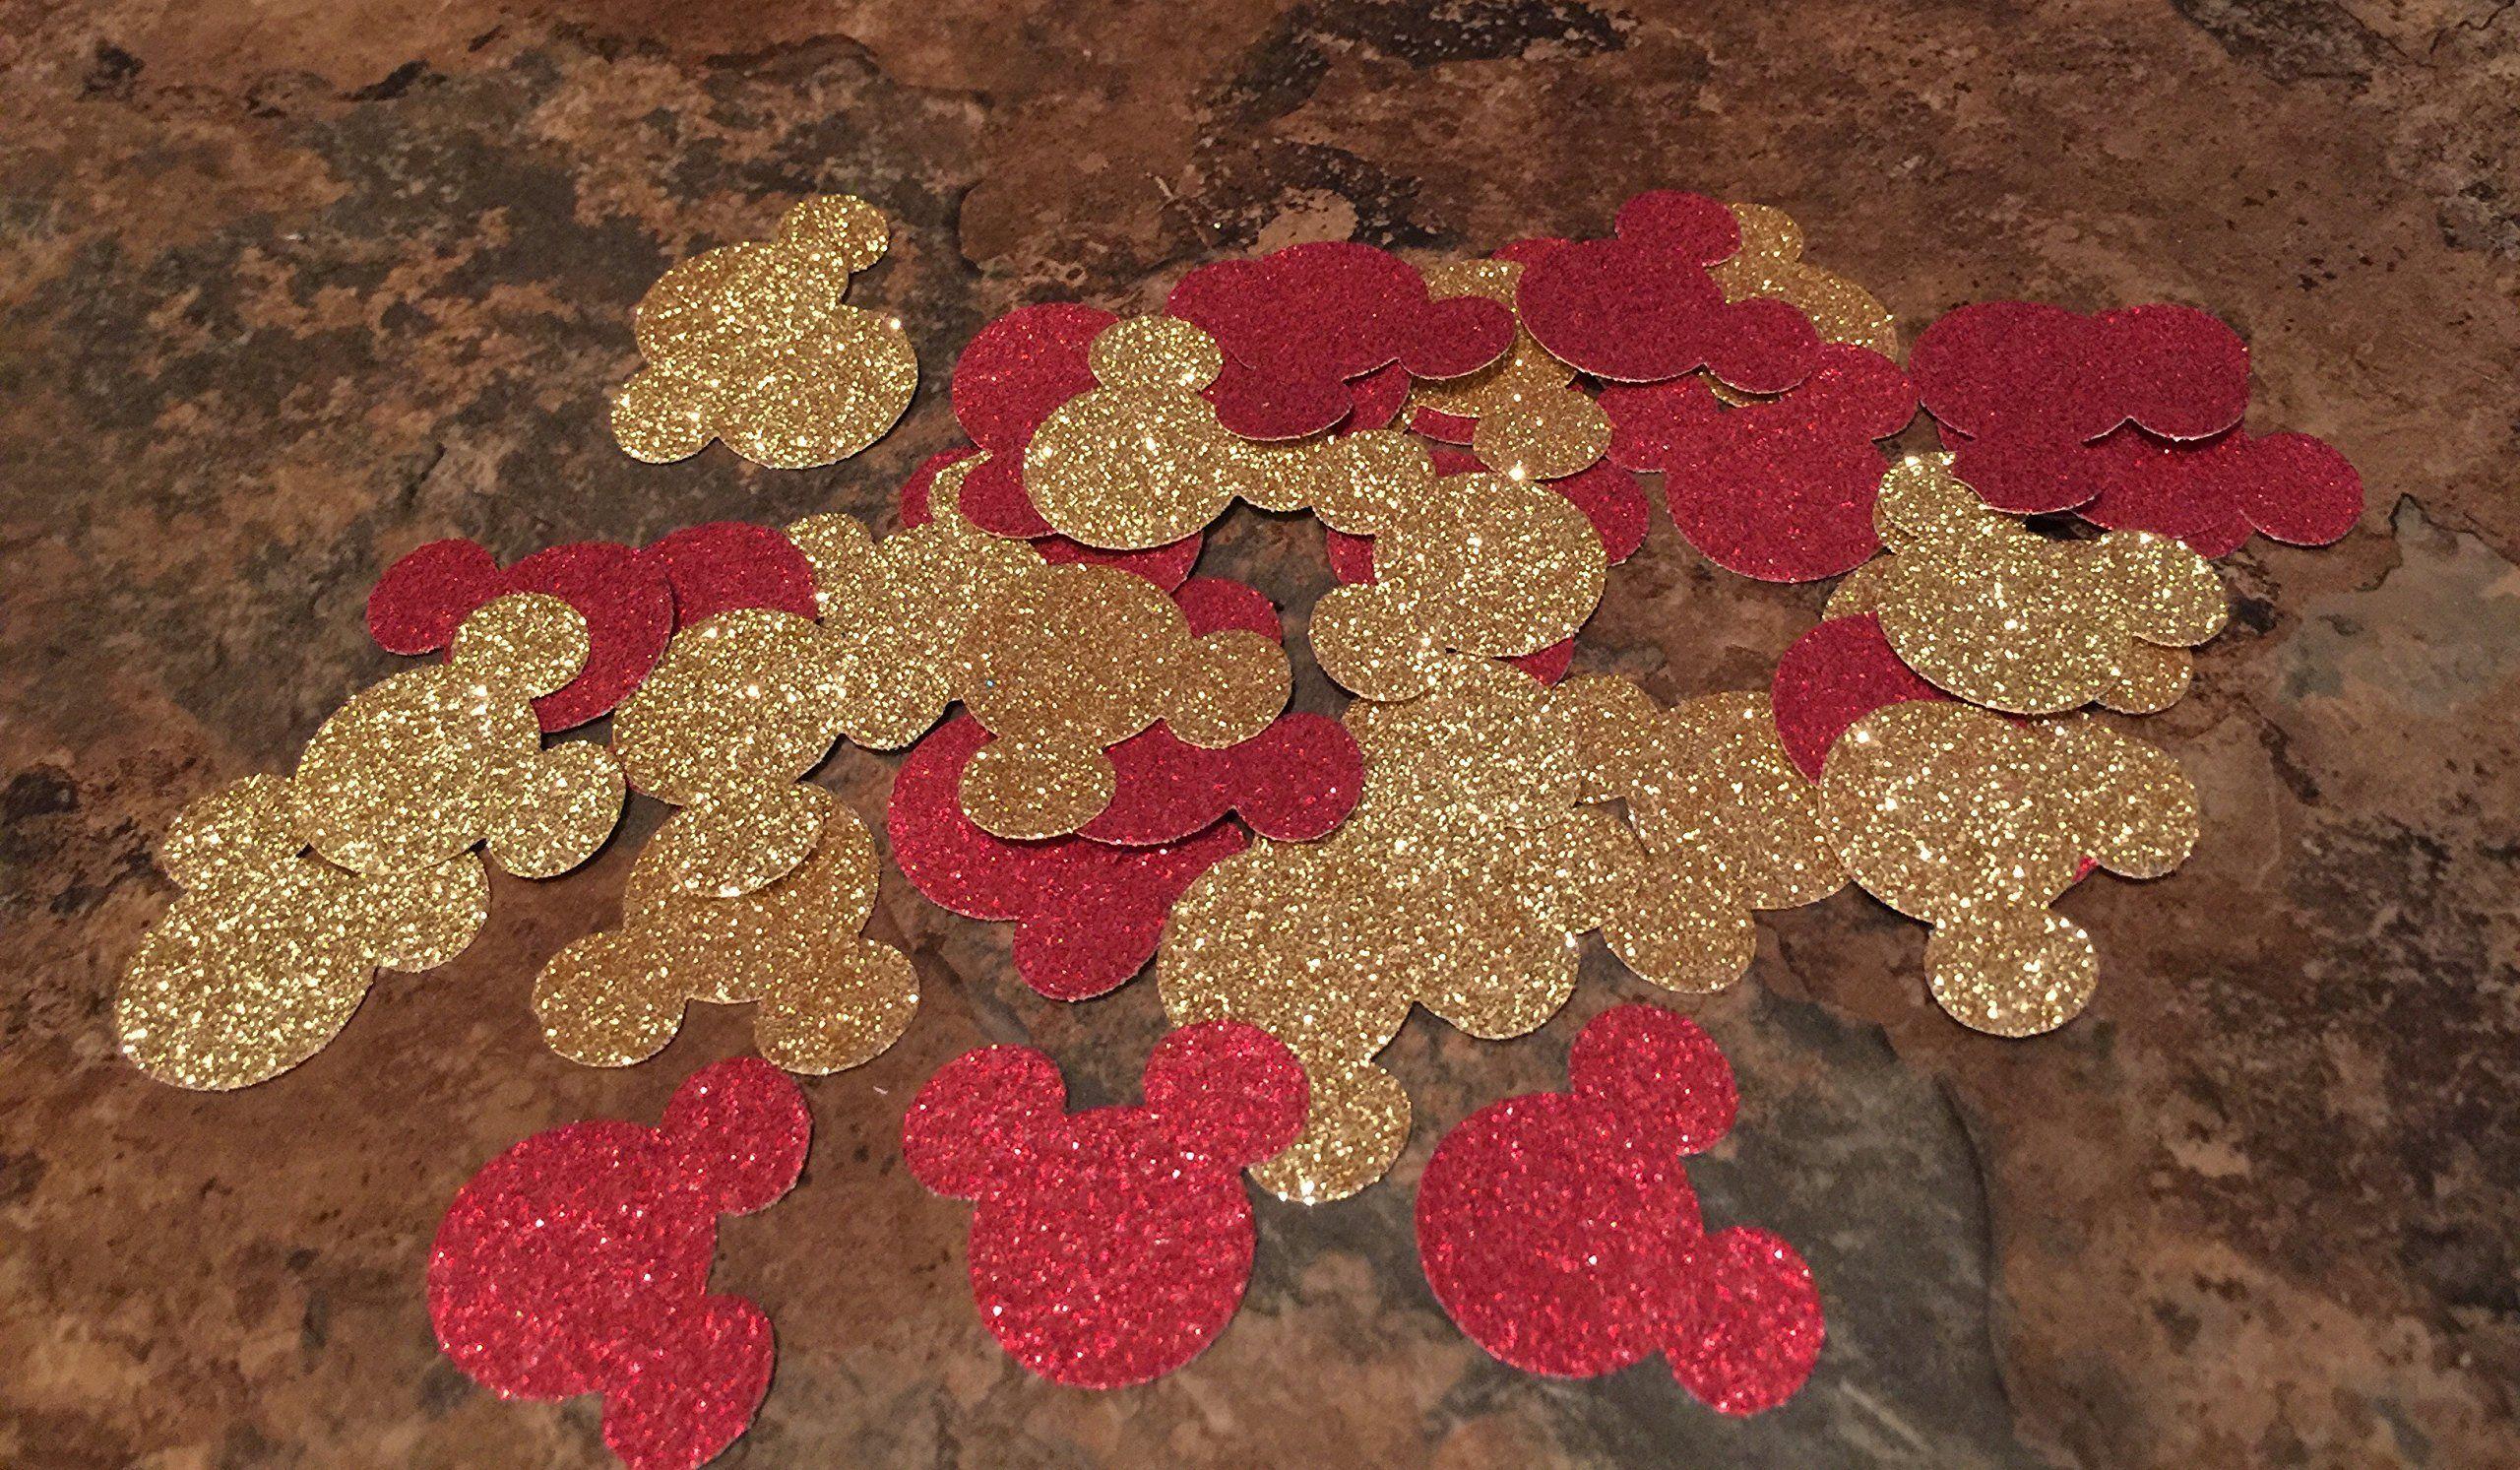 Table Decor 1 inch 100 Pieces Glitter Party Decoration Mouse Glitter Paper Confetti